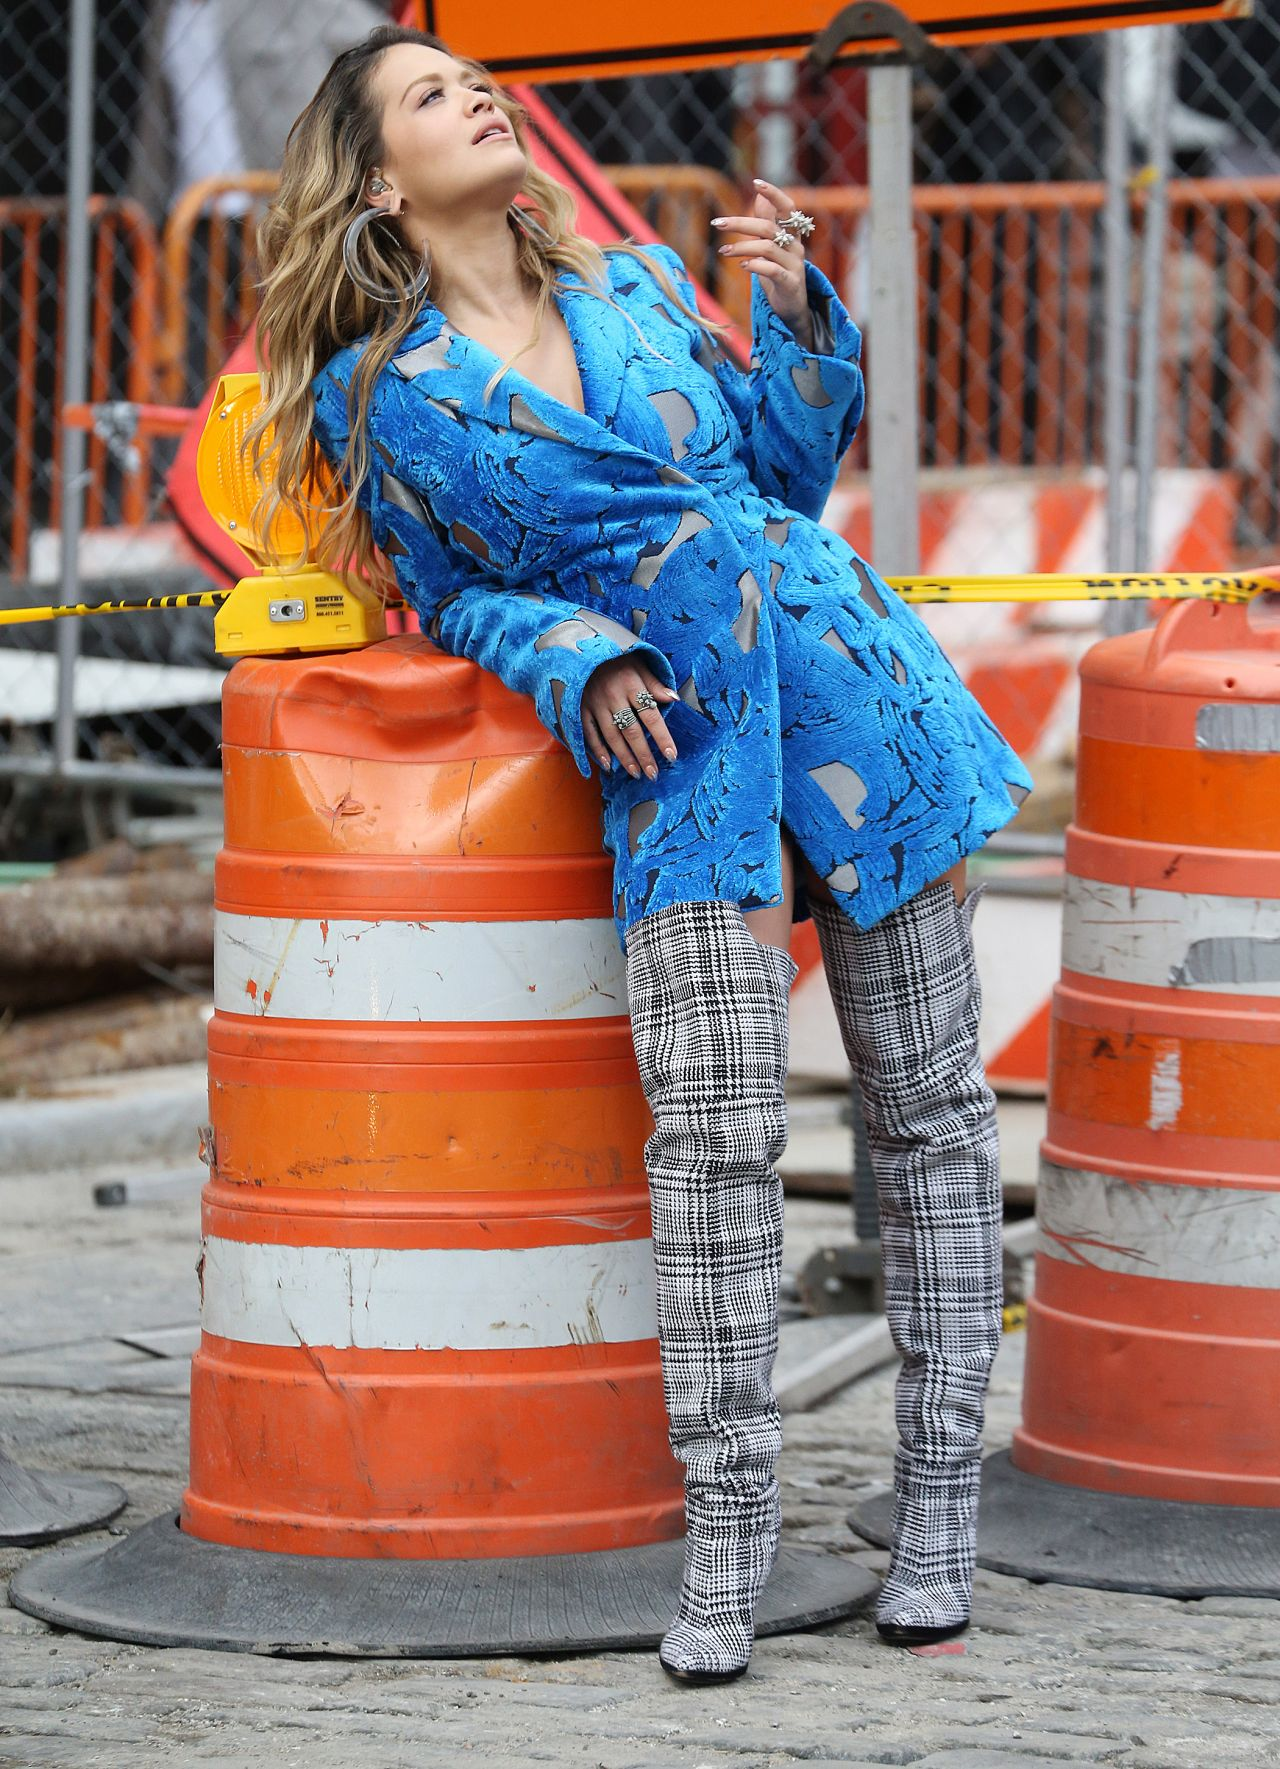 rita-ora-filming-a-music-video-in-new-york-city-10-05-2017-16.jpg